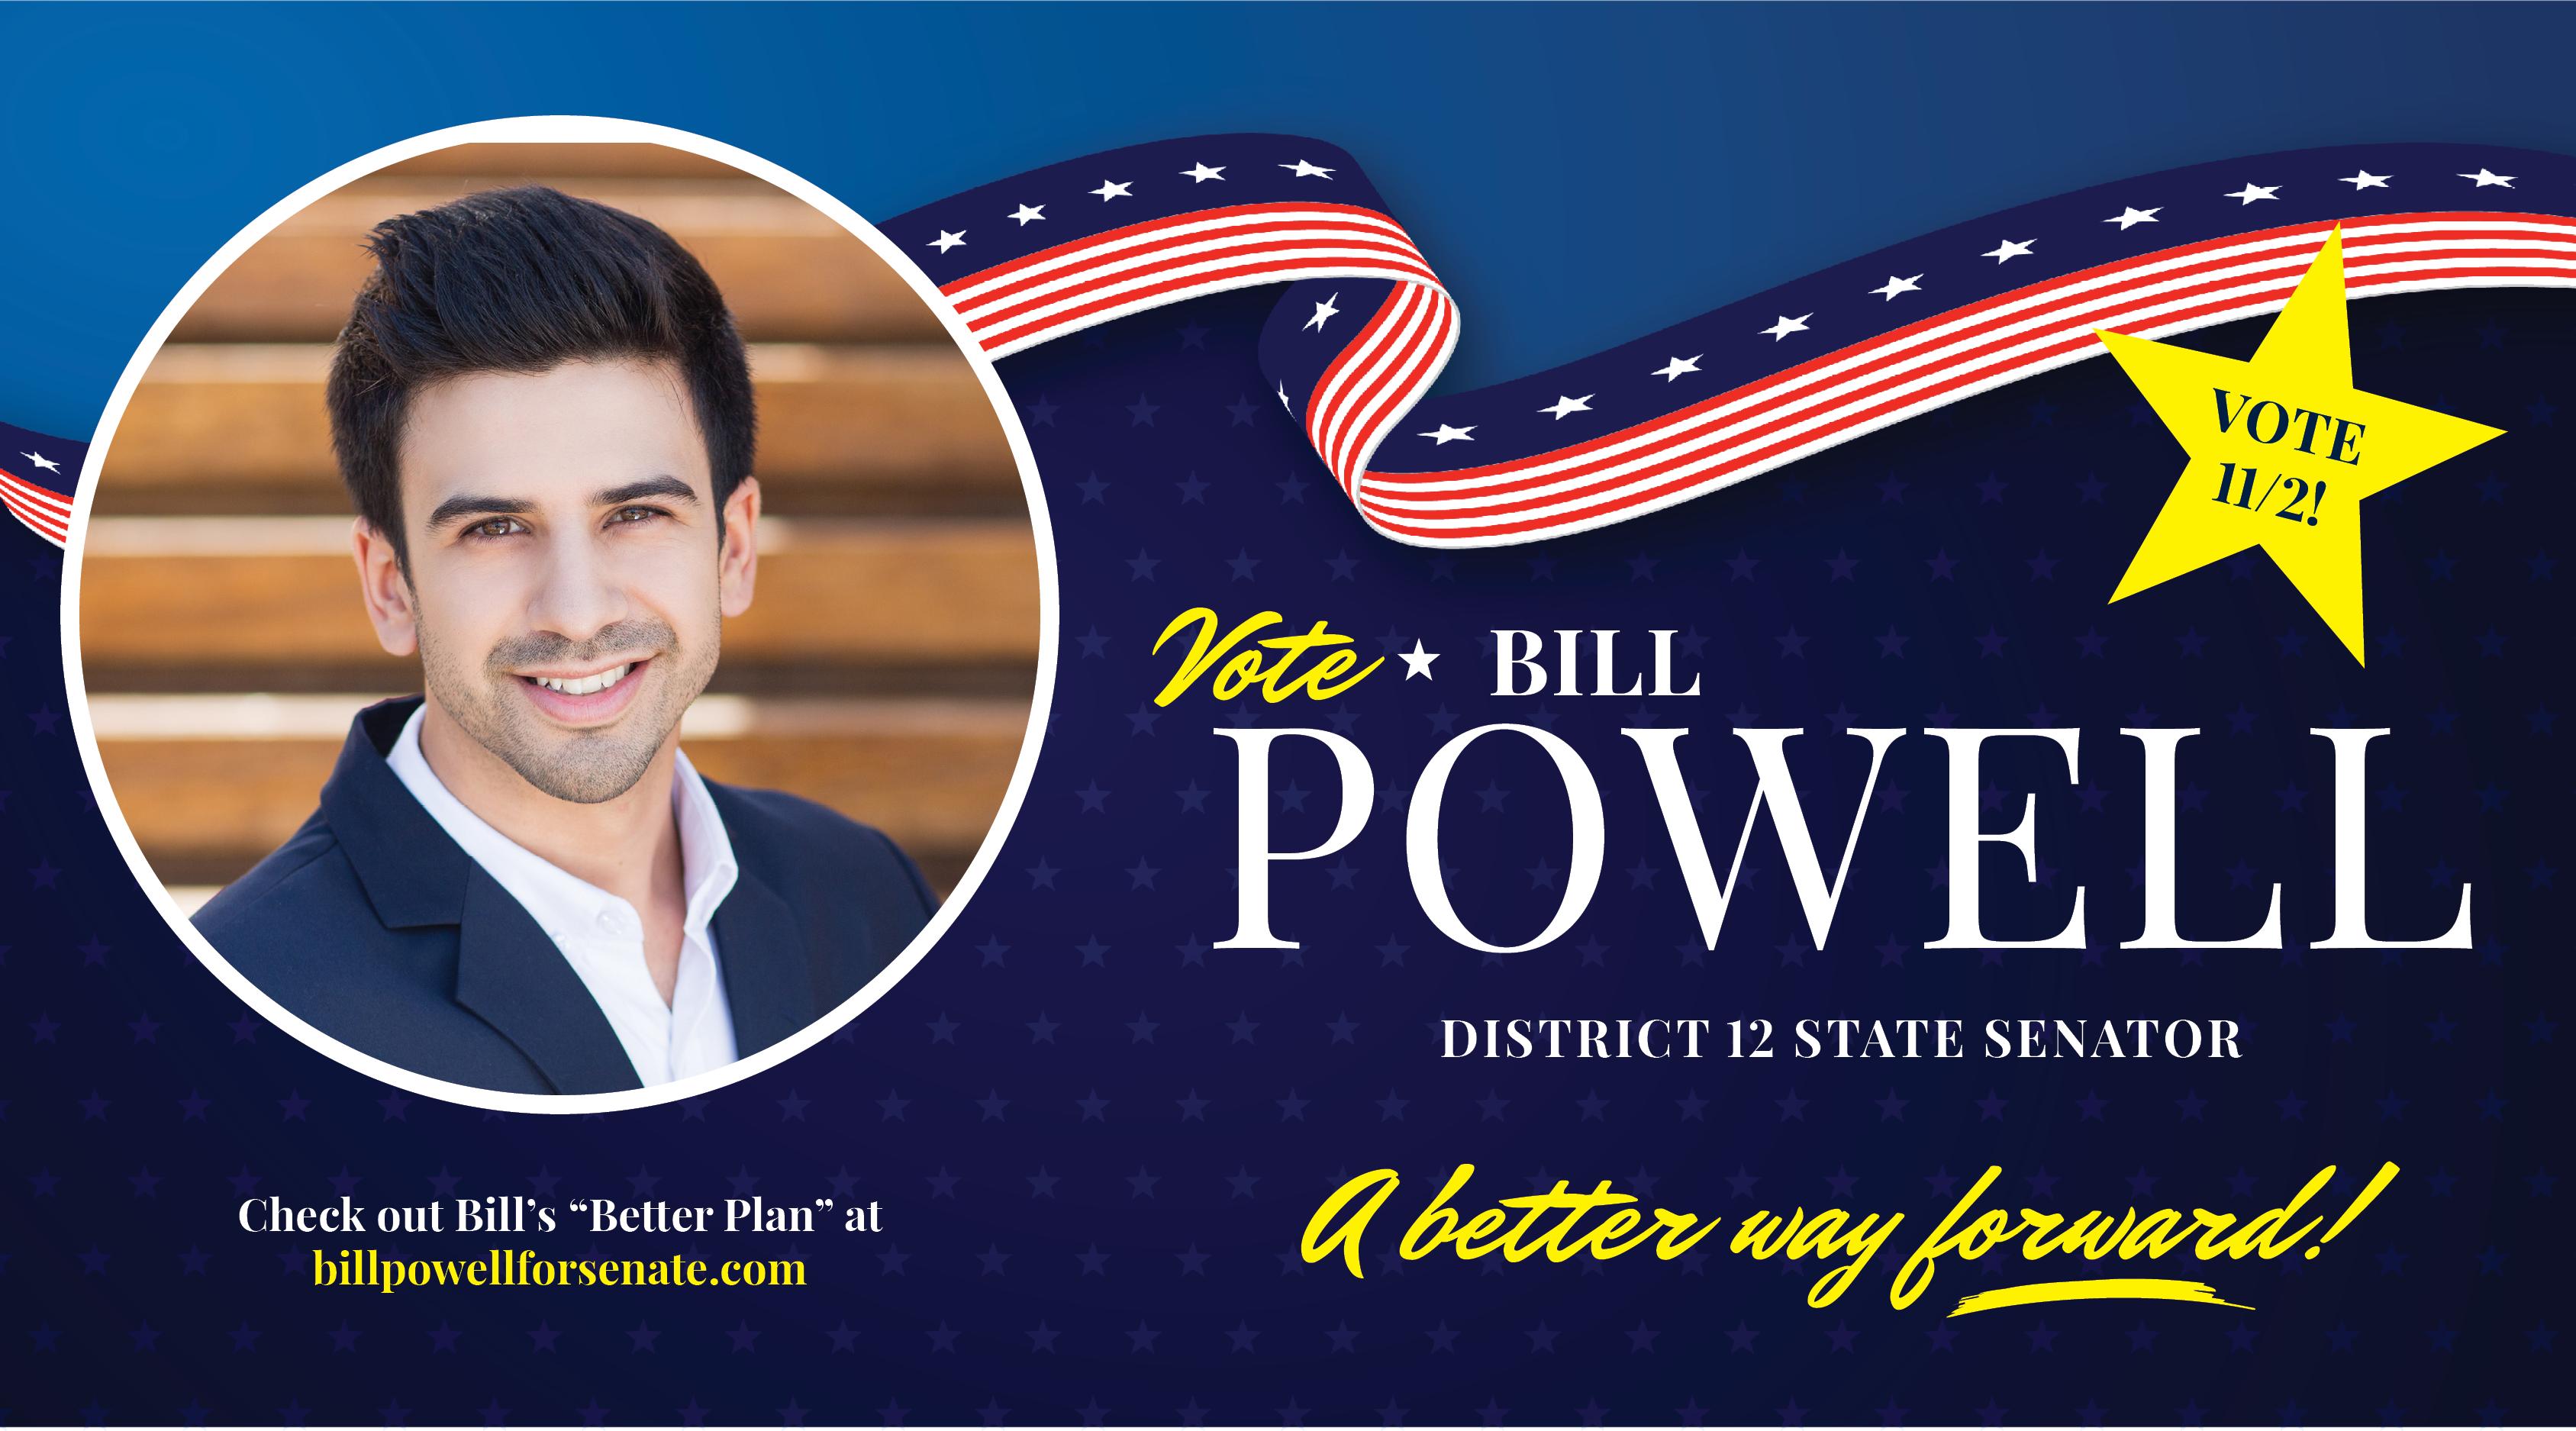 Political Campaign Postcard